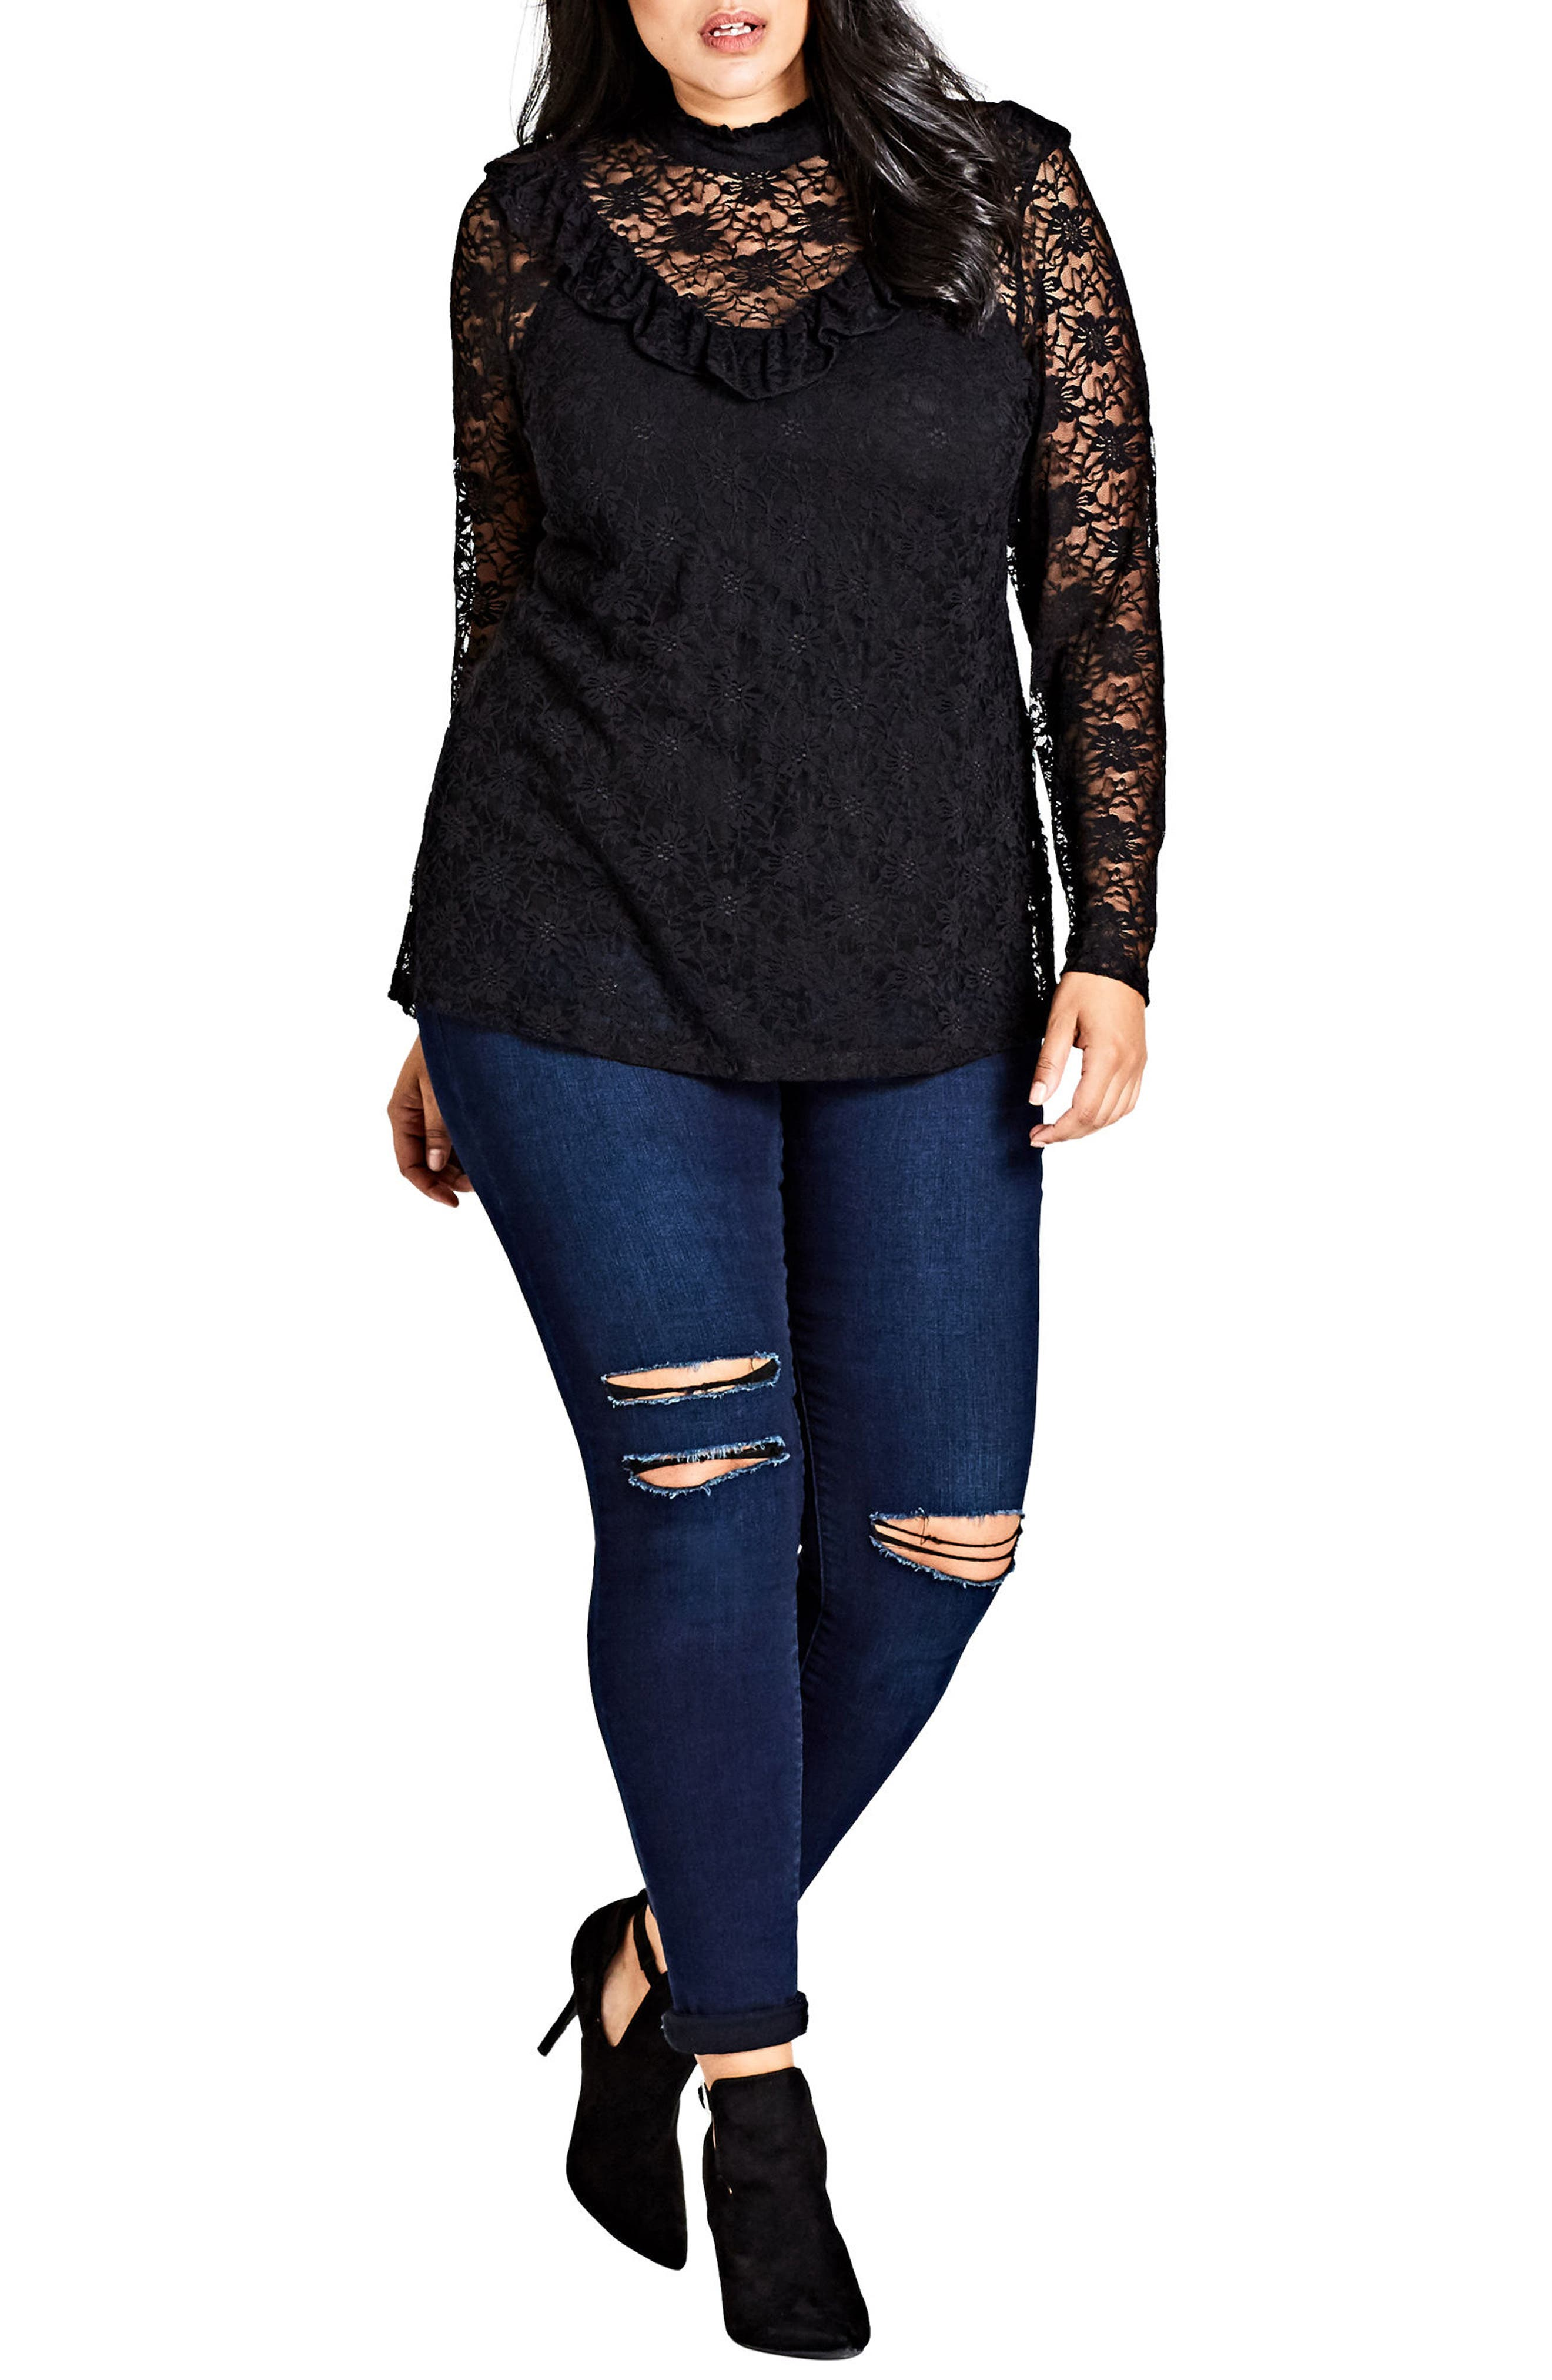 Main Image - City Chic Victorian Lace Top (Plus Size)